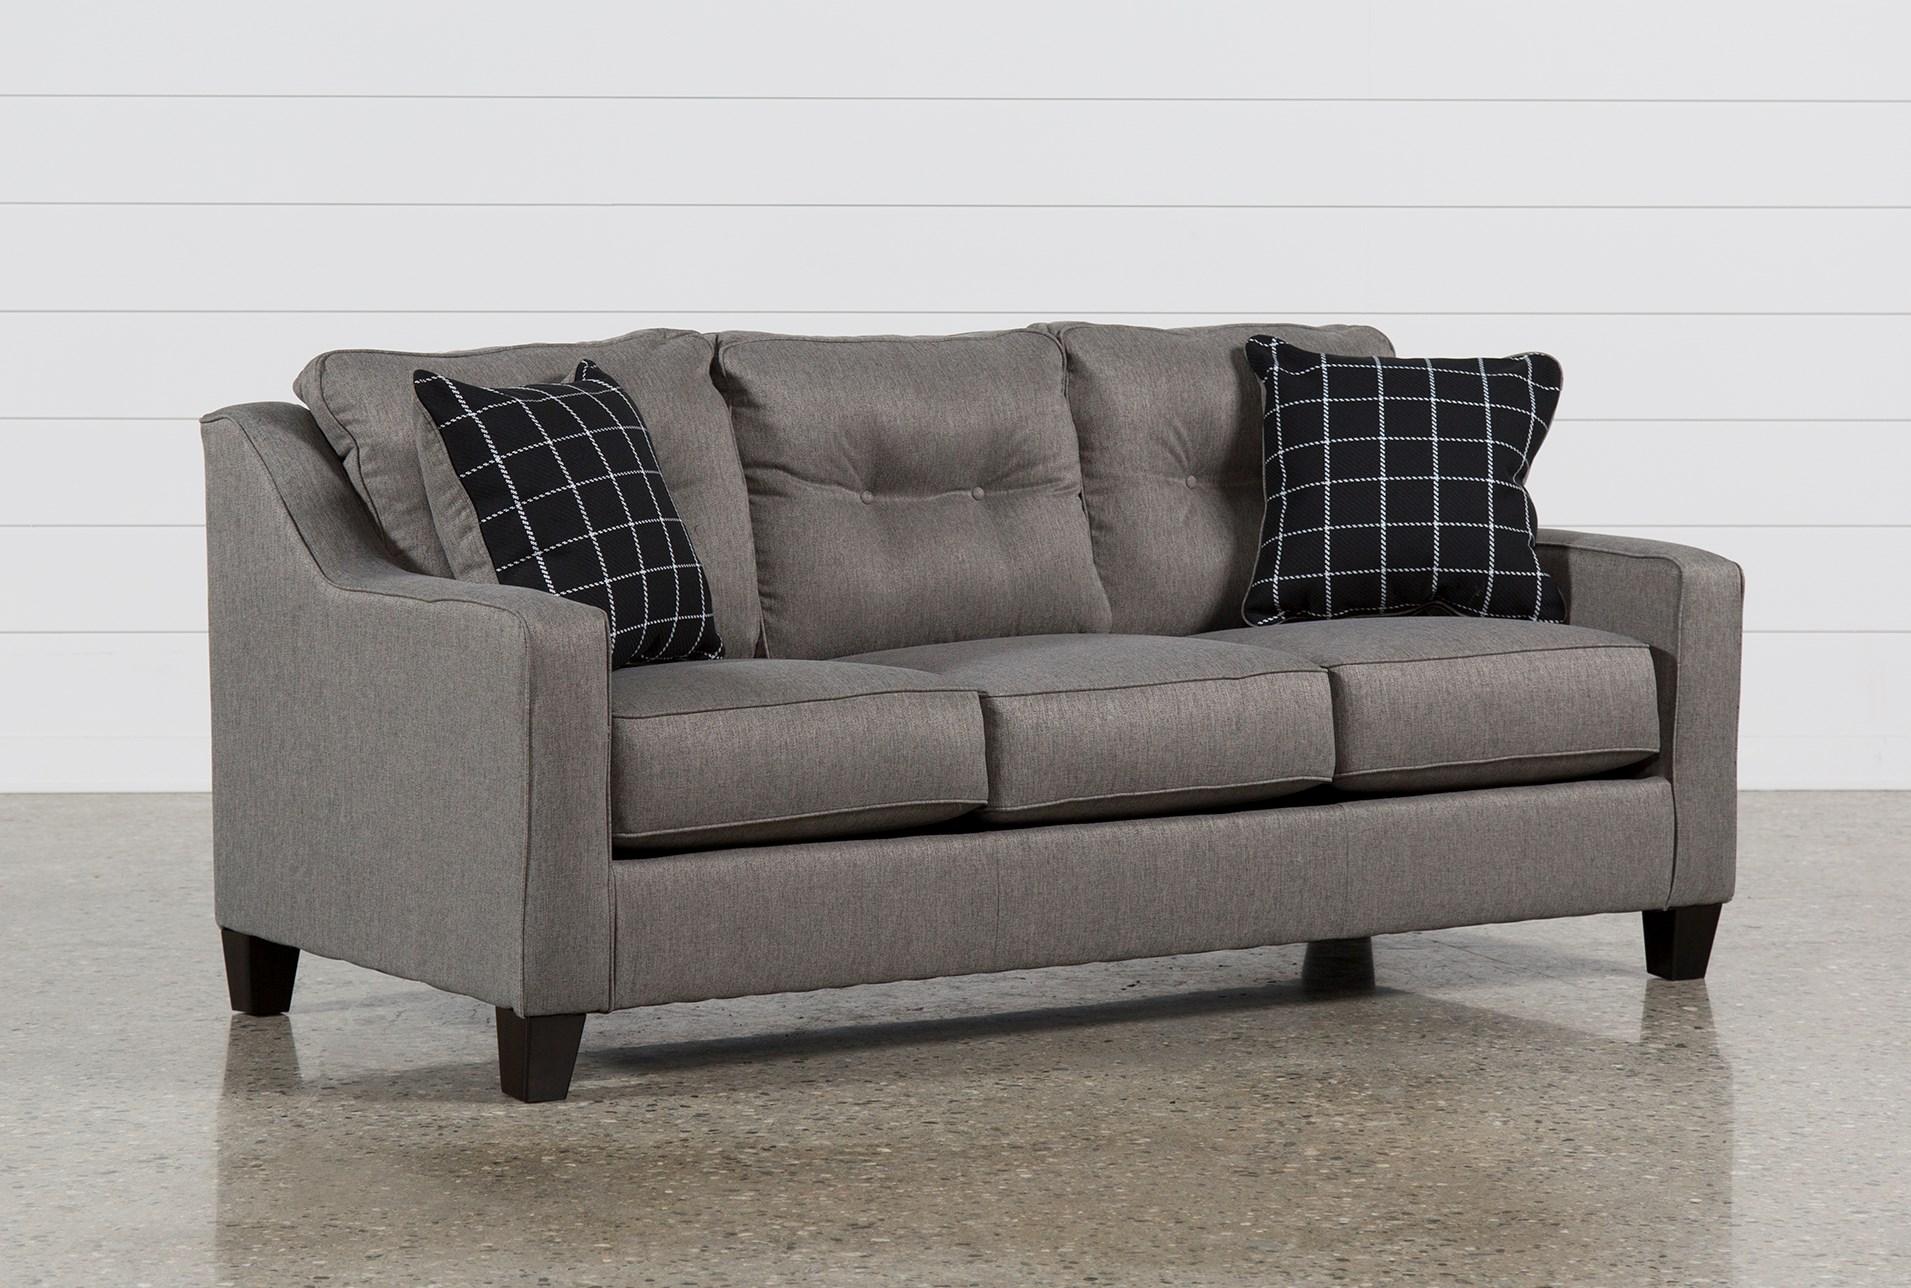 Brindon Charcoal Queen Sofa Sleeper Living Spaces